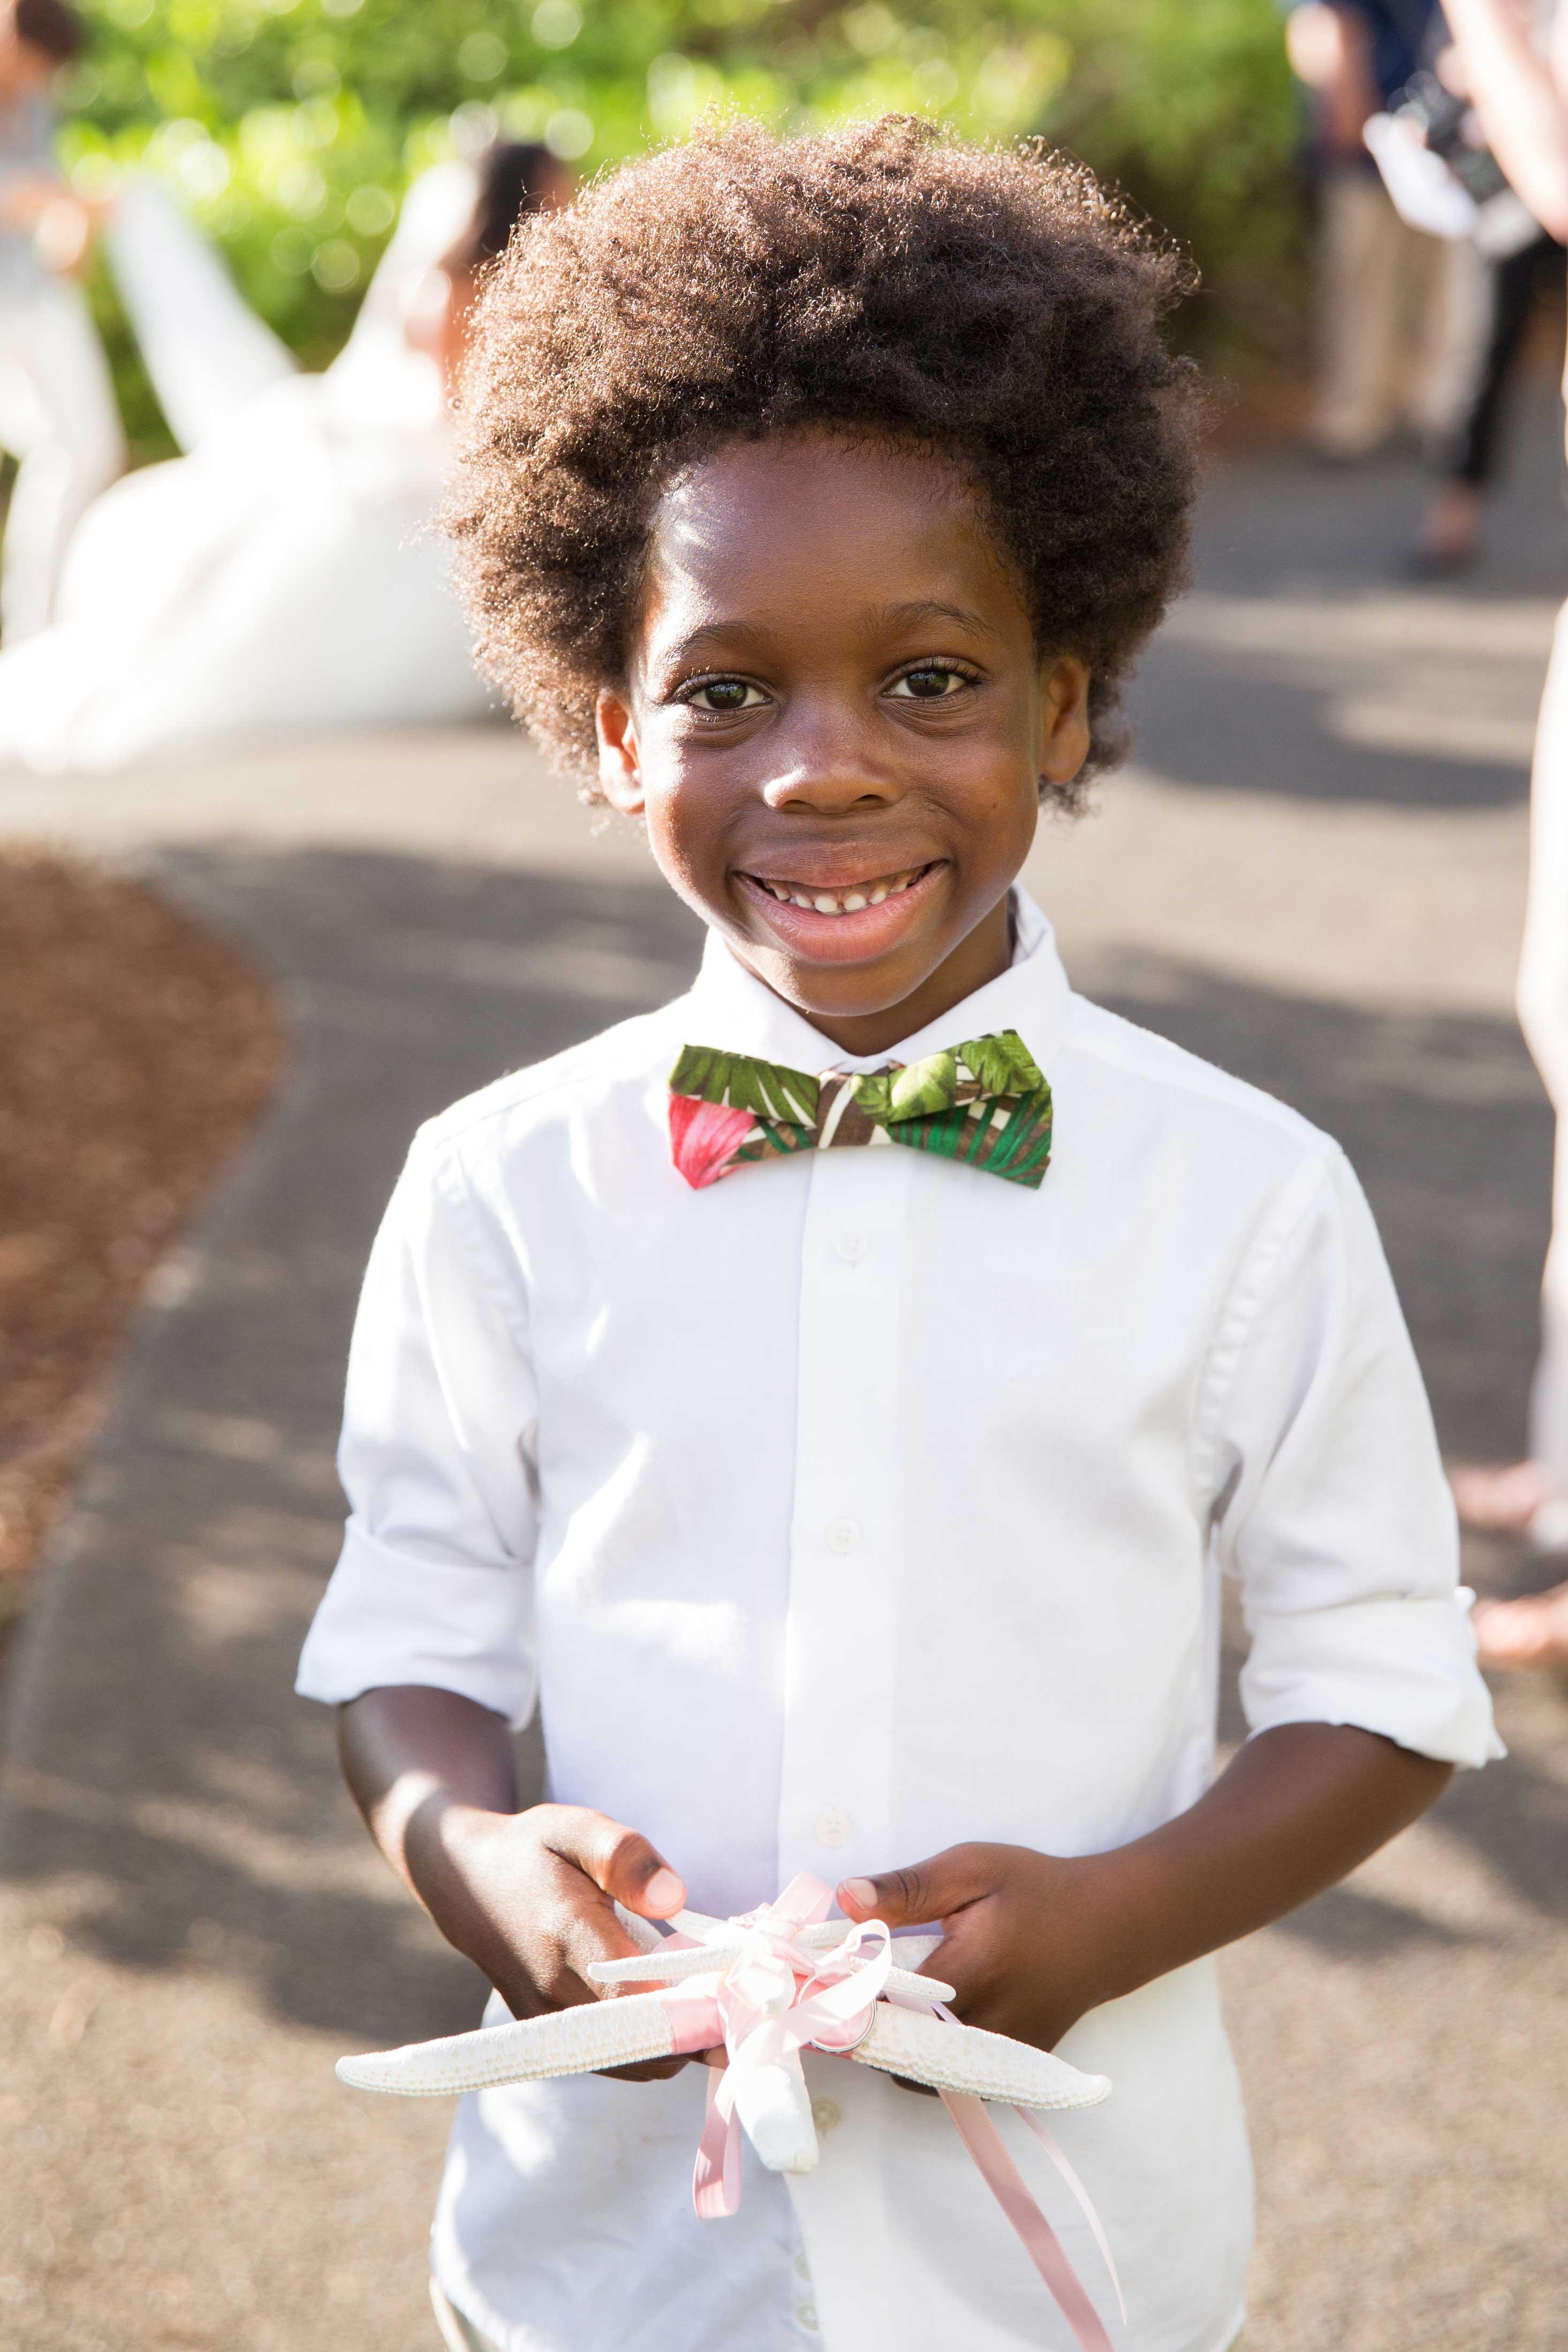 Chudney Ross destination wedding in Hawaii ring bearer holding starfish Diana Ross grandson